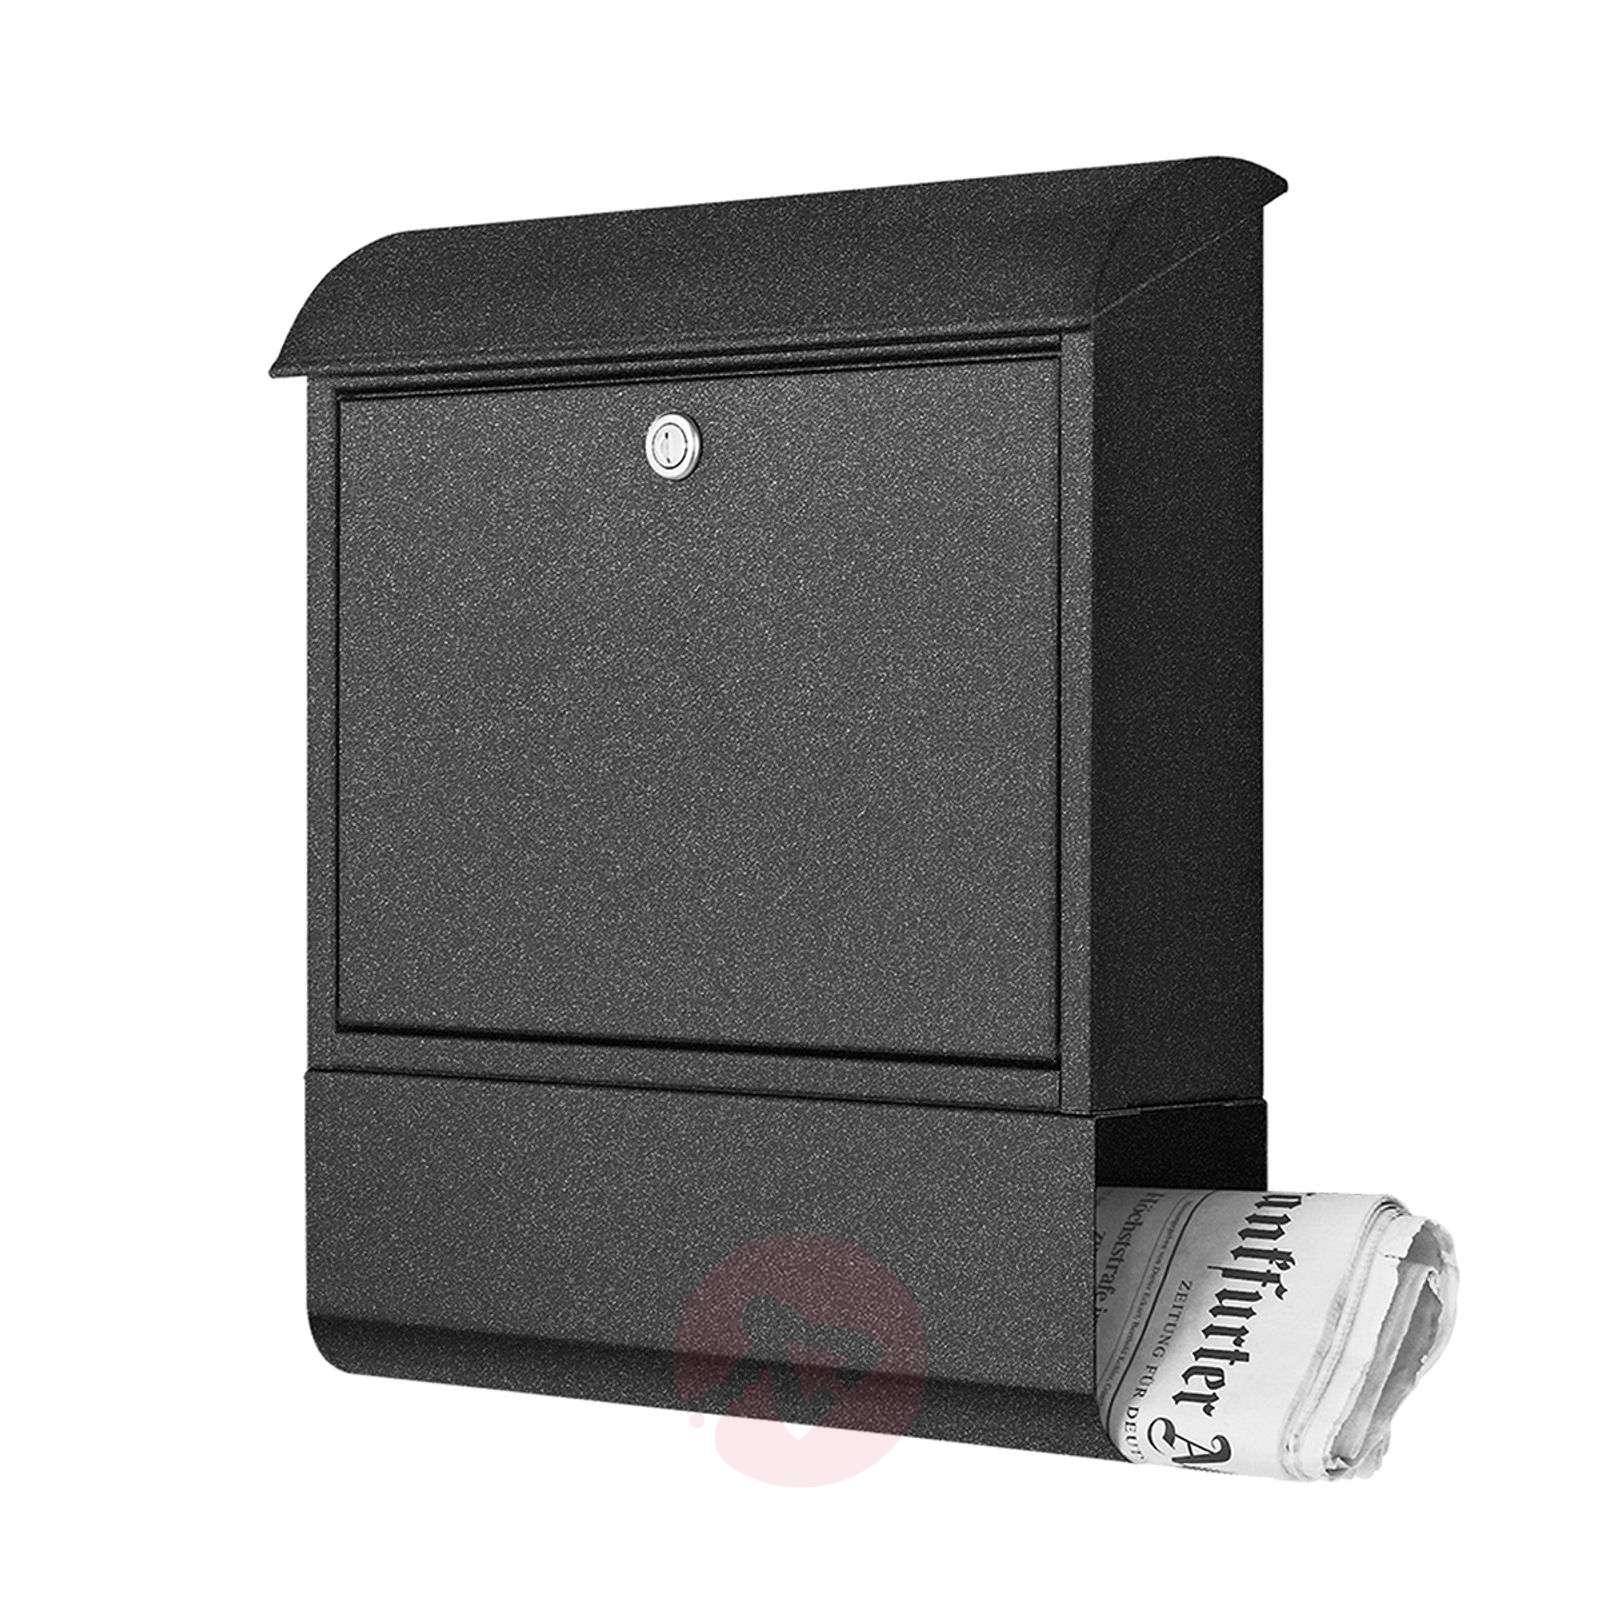 Galvanised letterbox Joram with newspaper holder-4502373-01